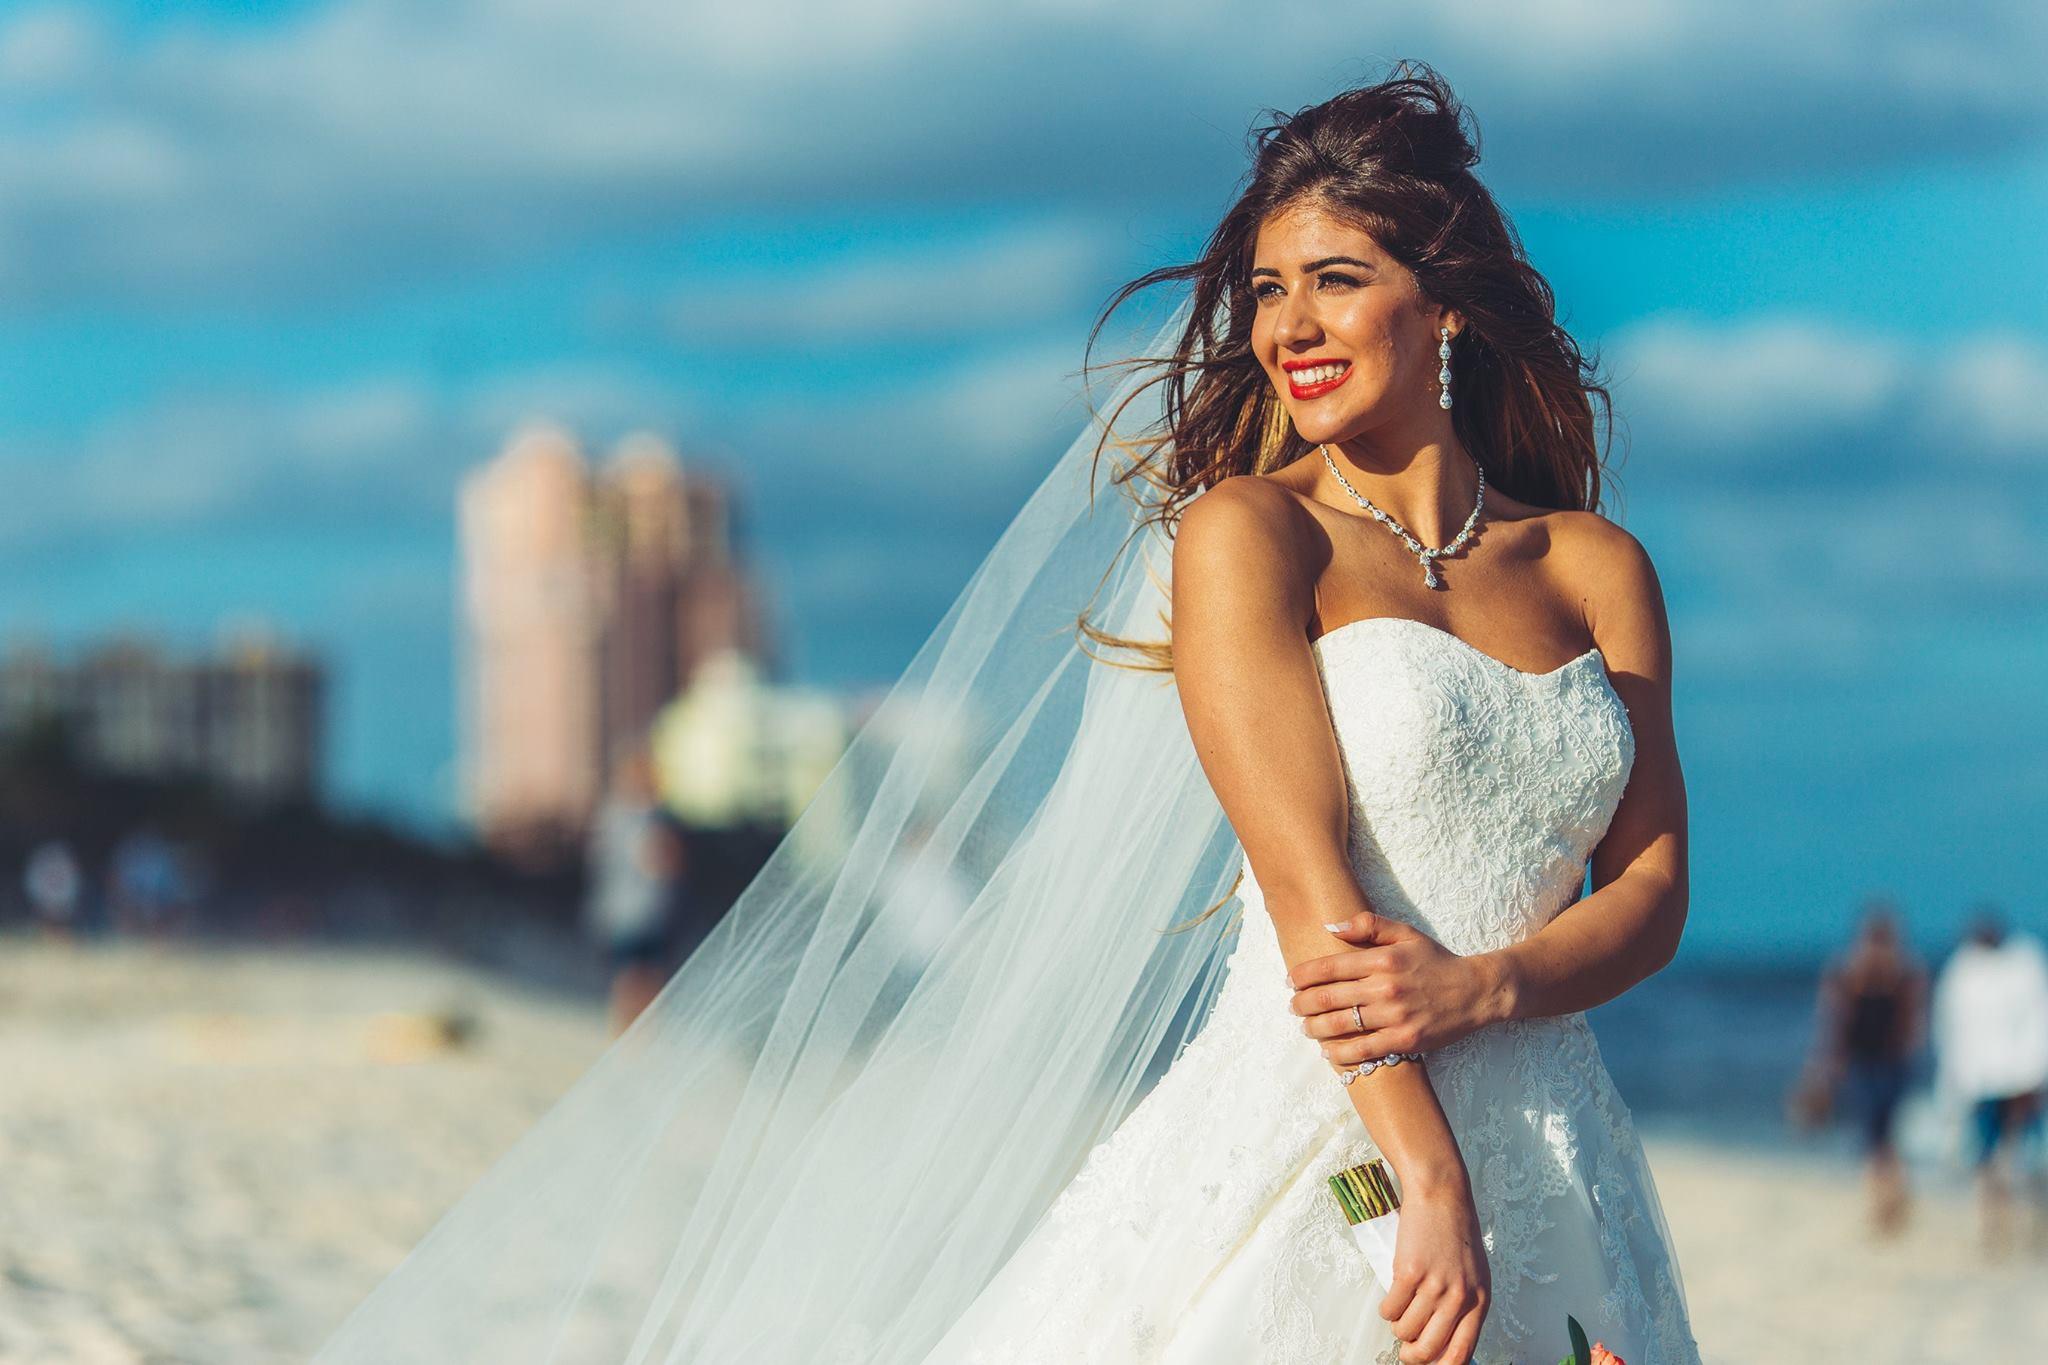 Dina Khoury